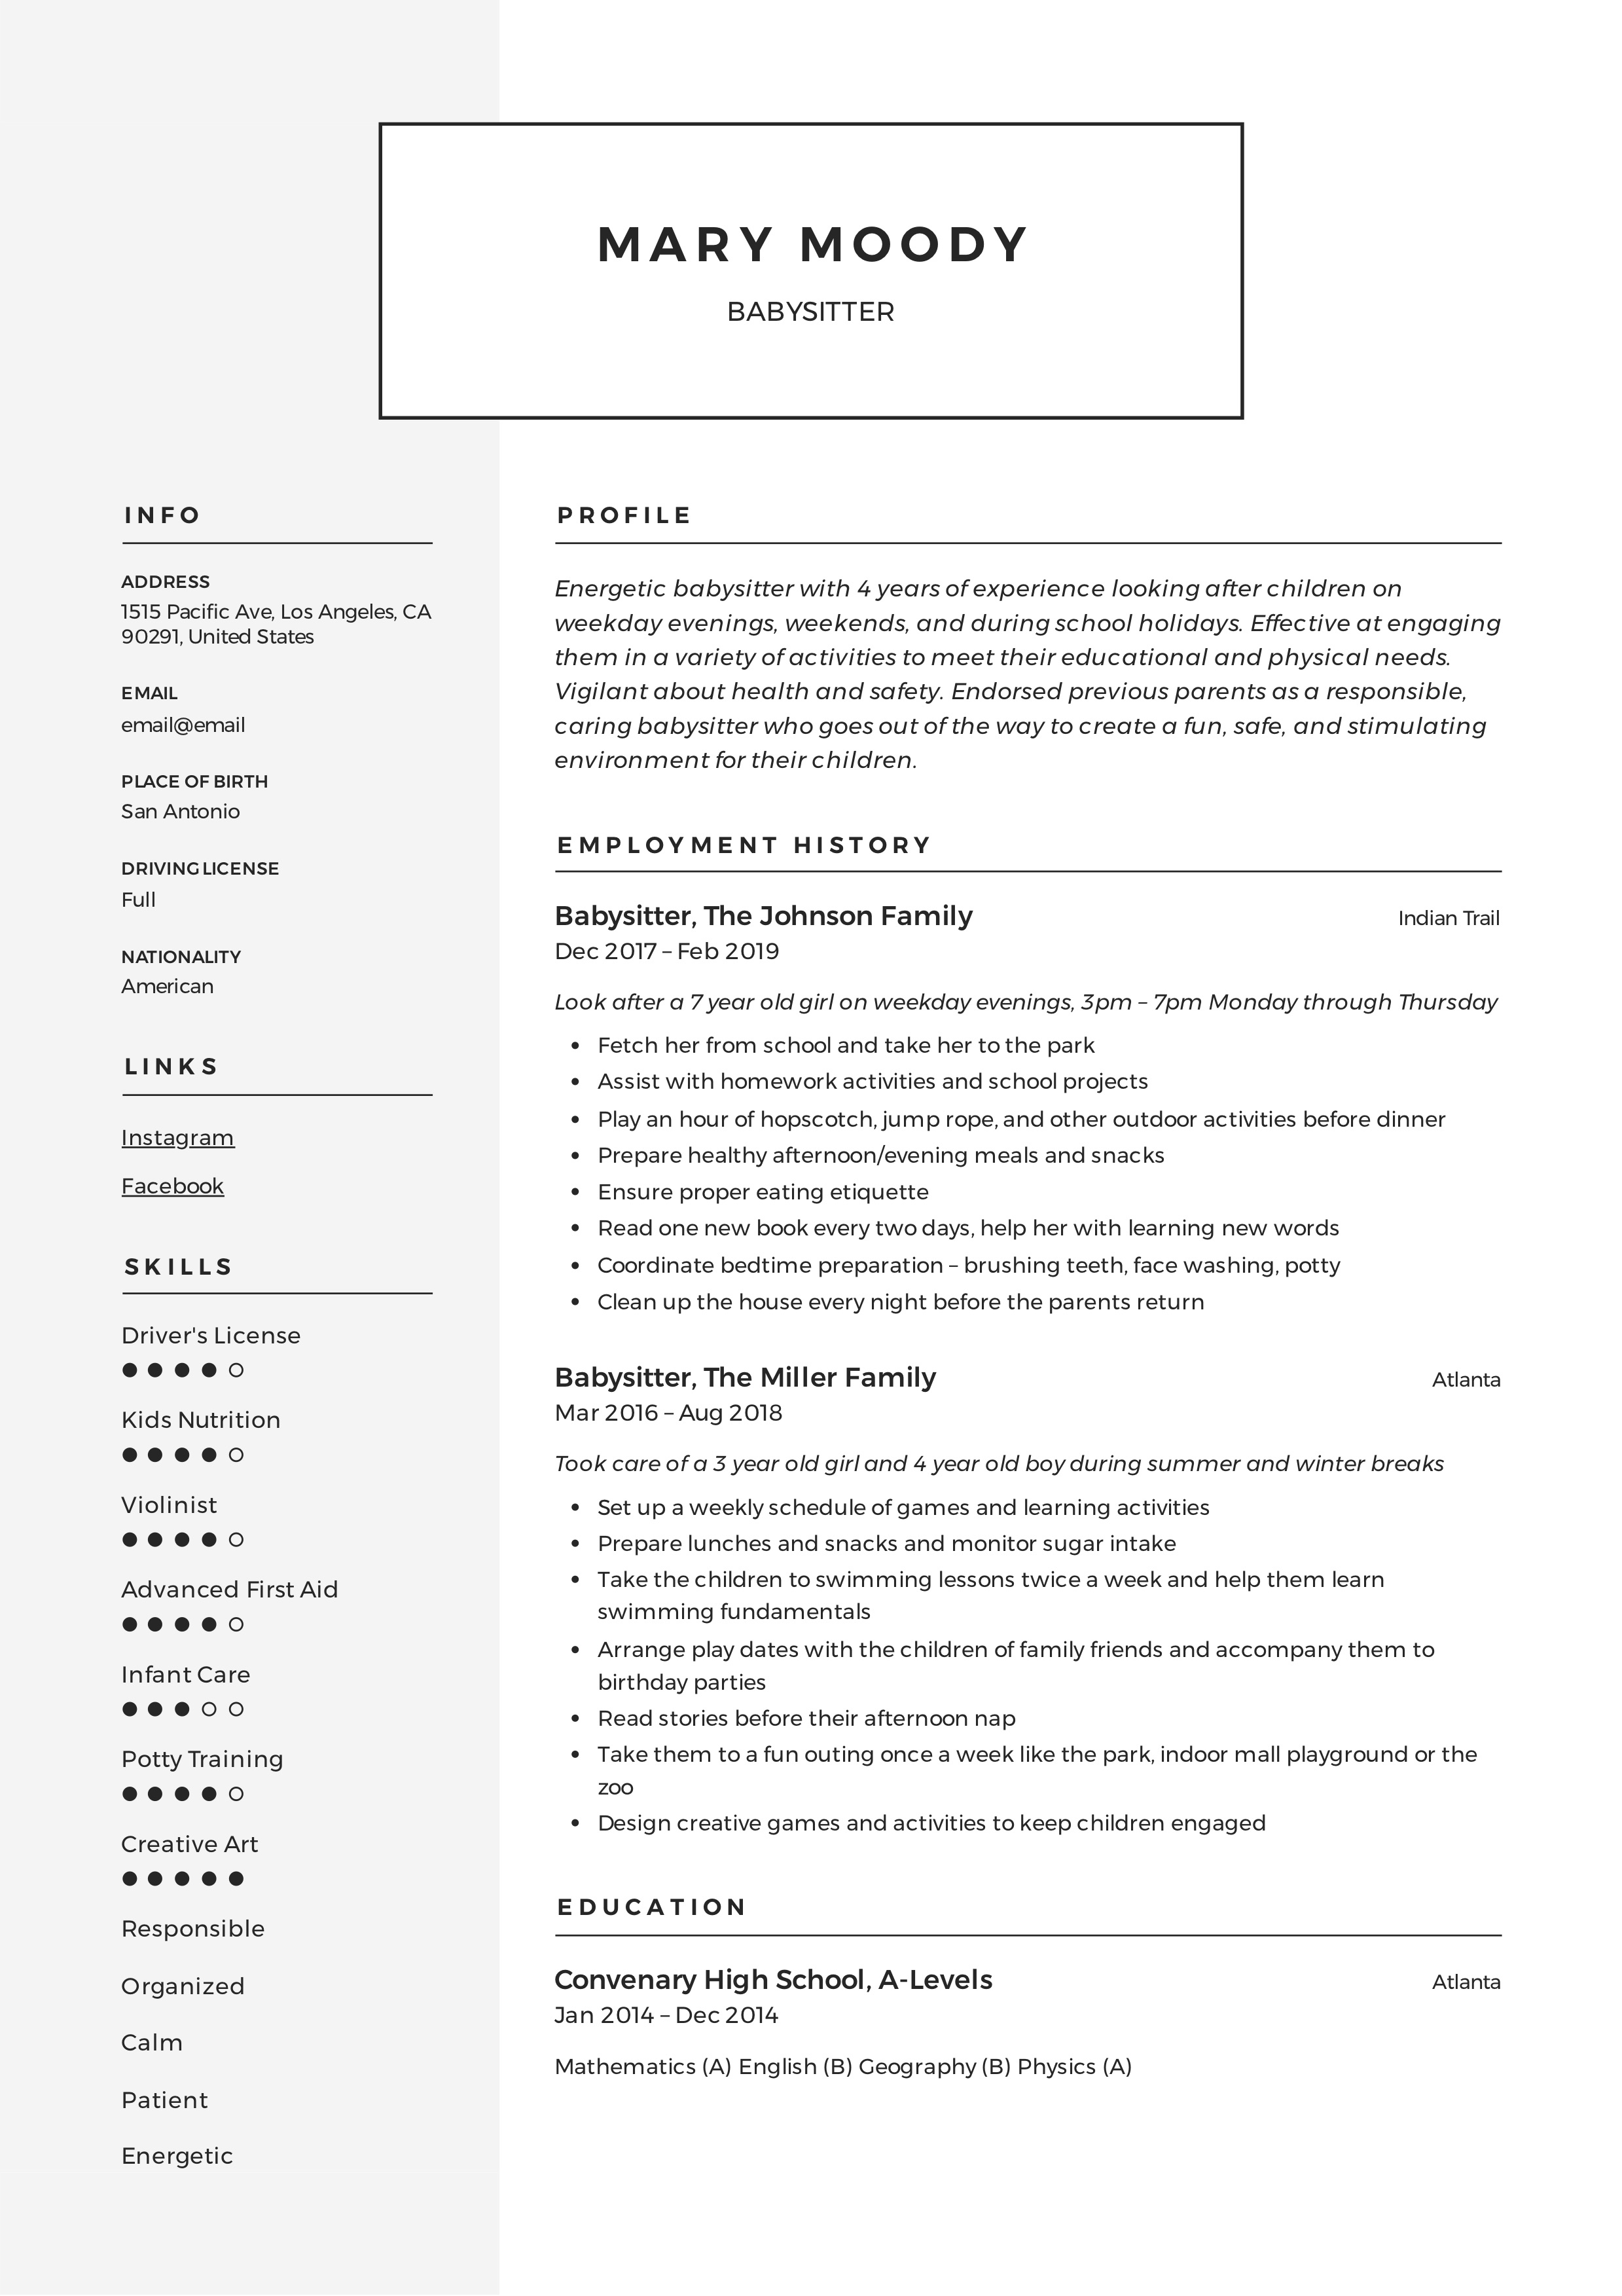 Babysitter Resume Example Amp Writing Guide 12 Samples